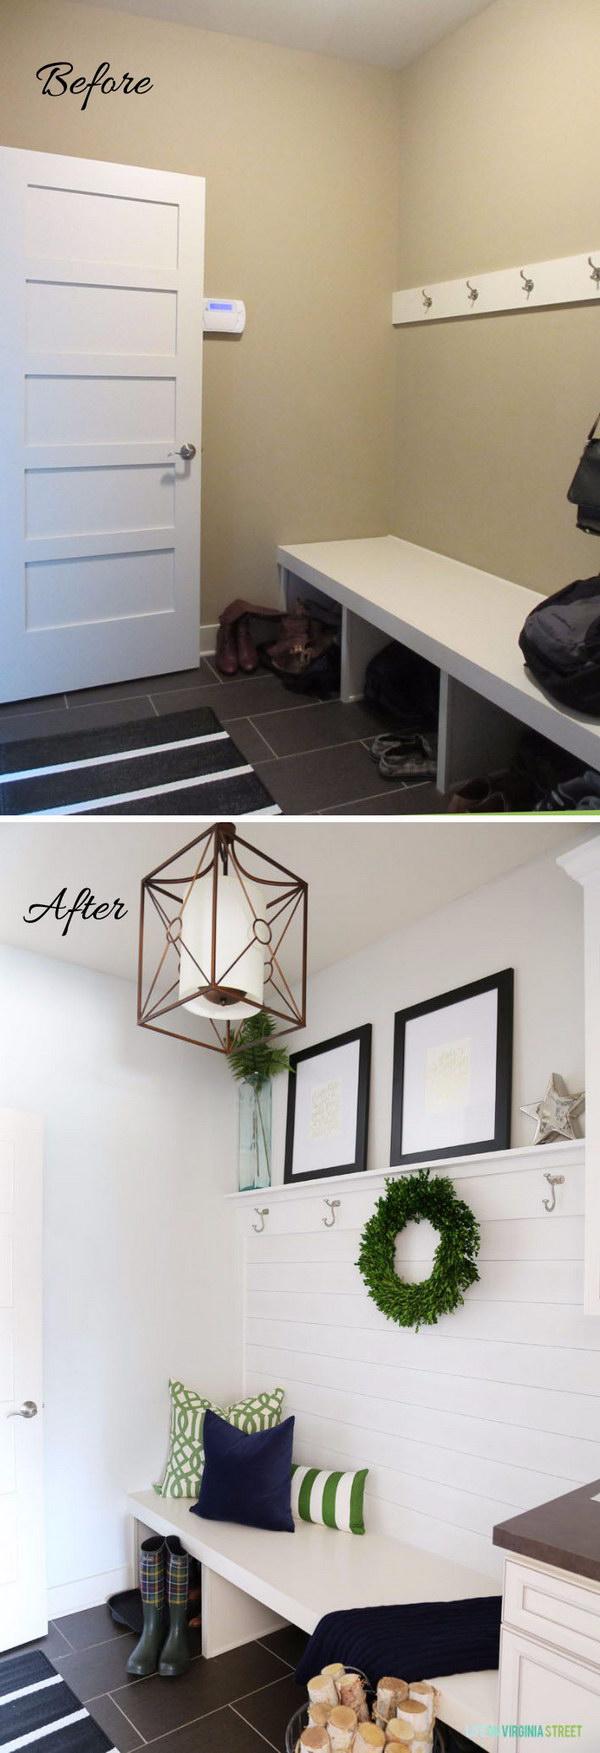 18 entryway makeover diy ideas tutorials - 30+ DIY Ideas to Give a Makeover to a Your Entryway